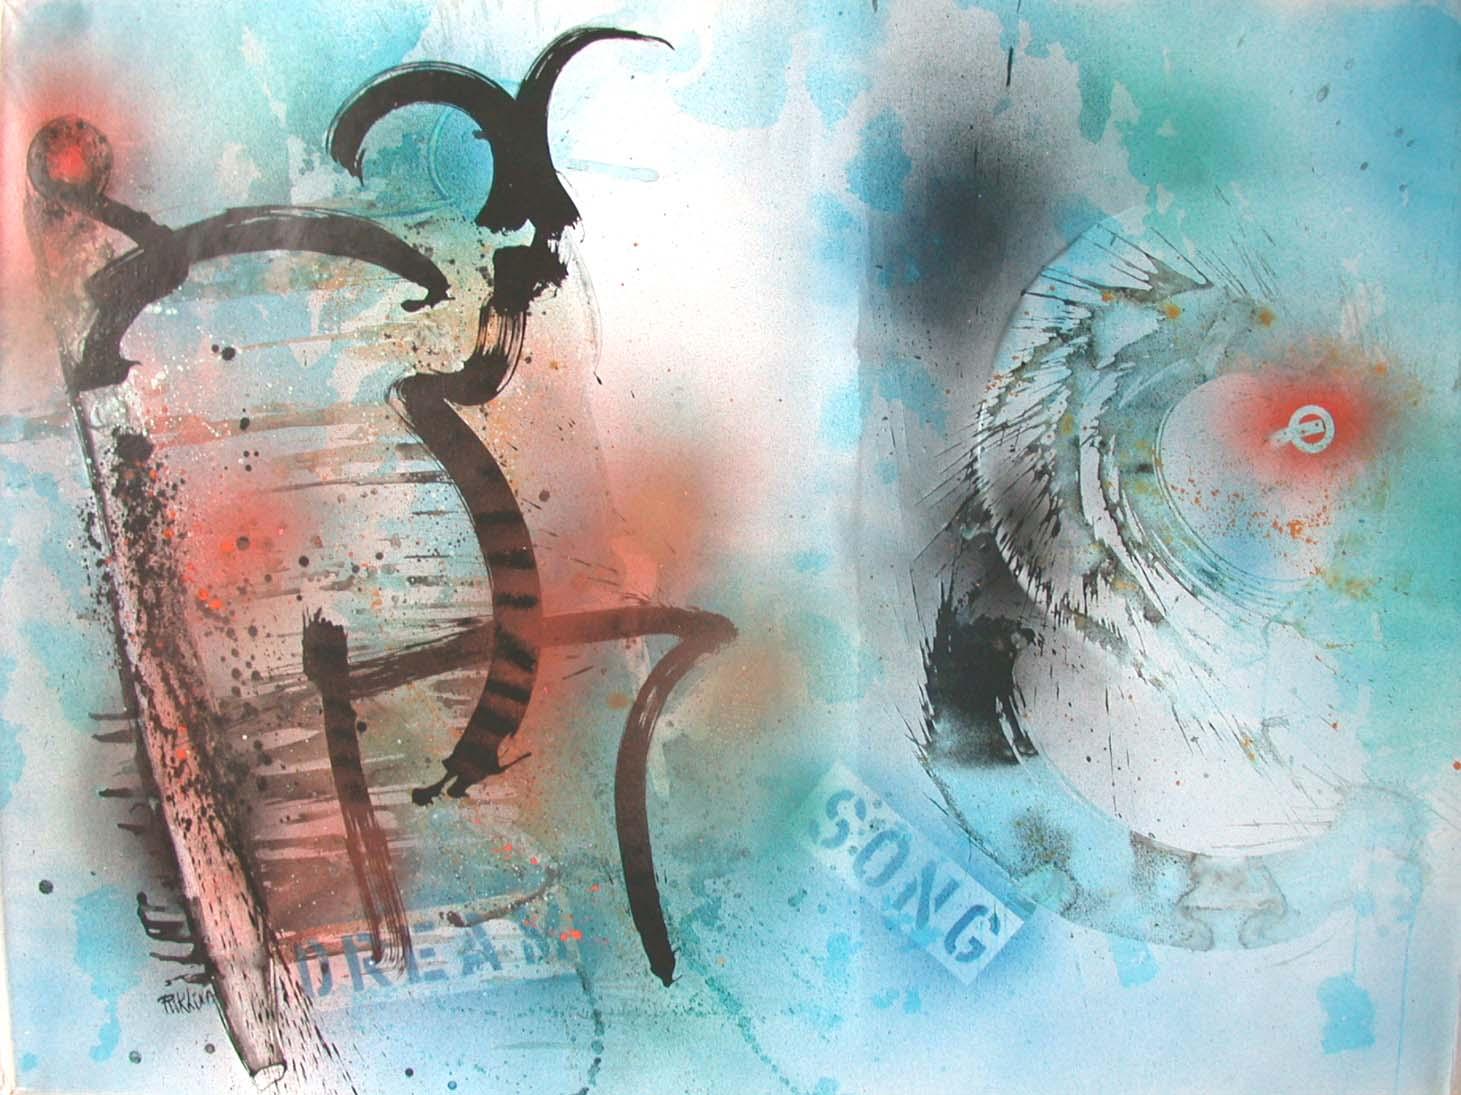 1992 dream song (the sjaman)140x180